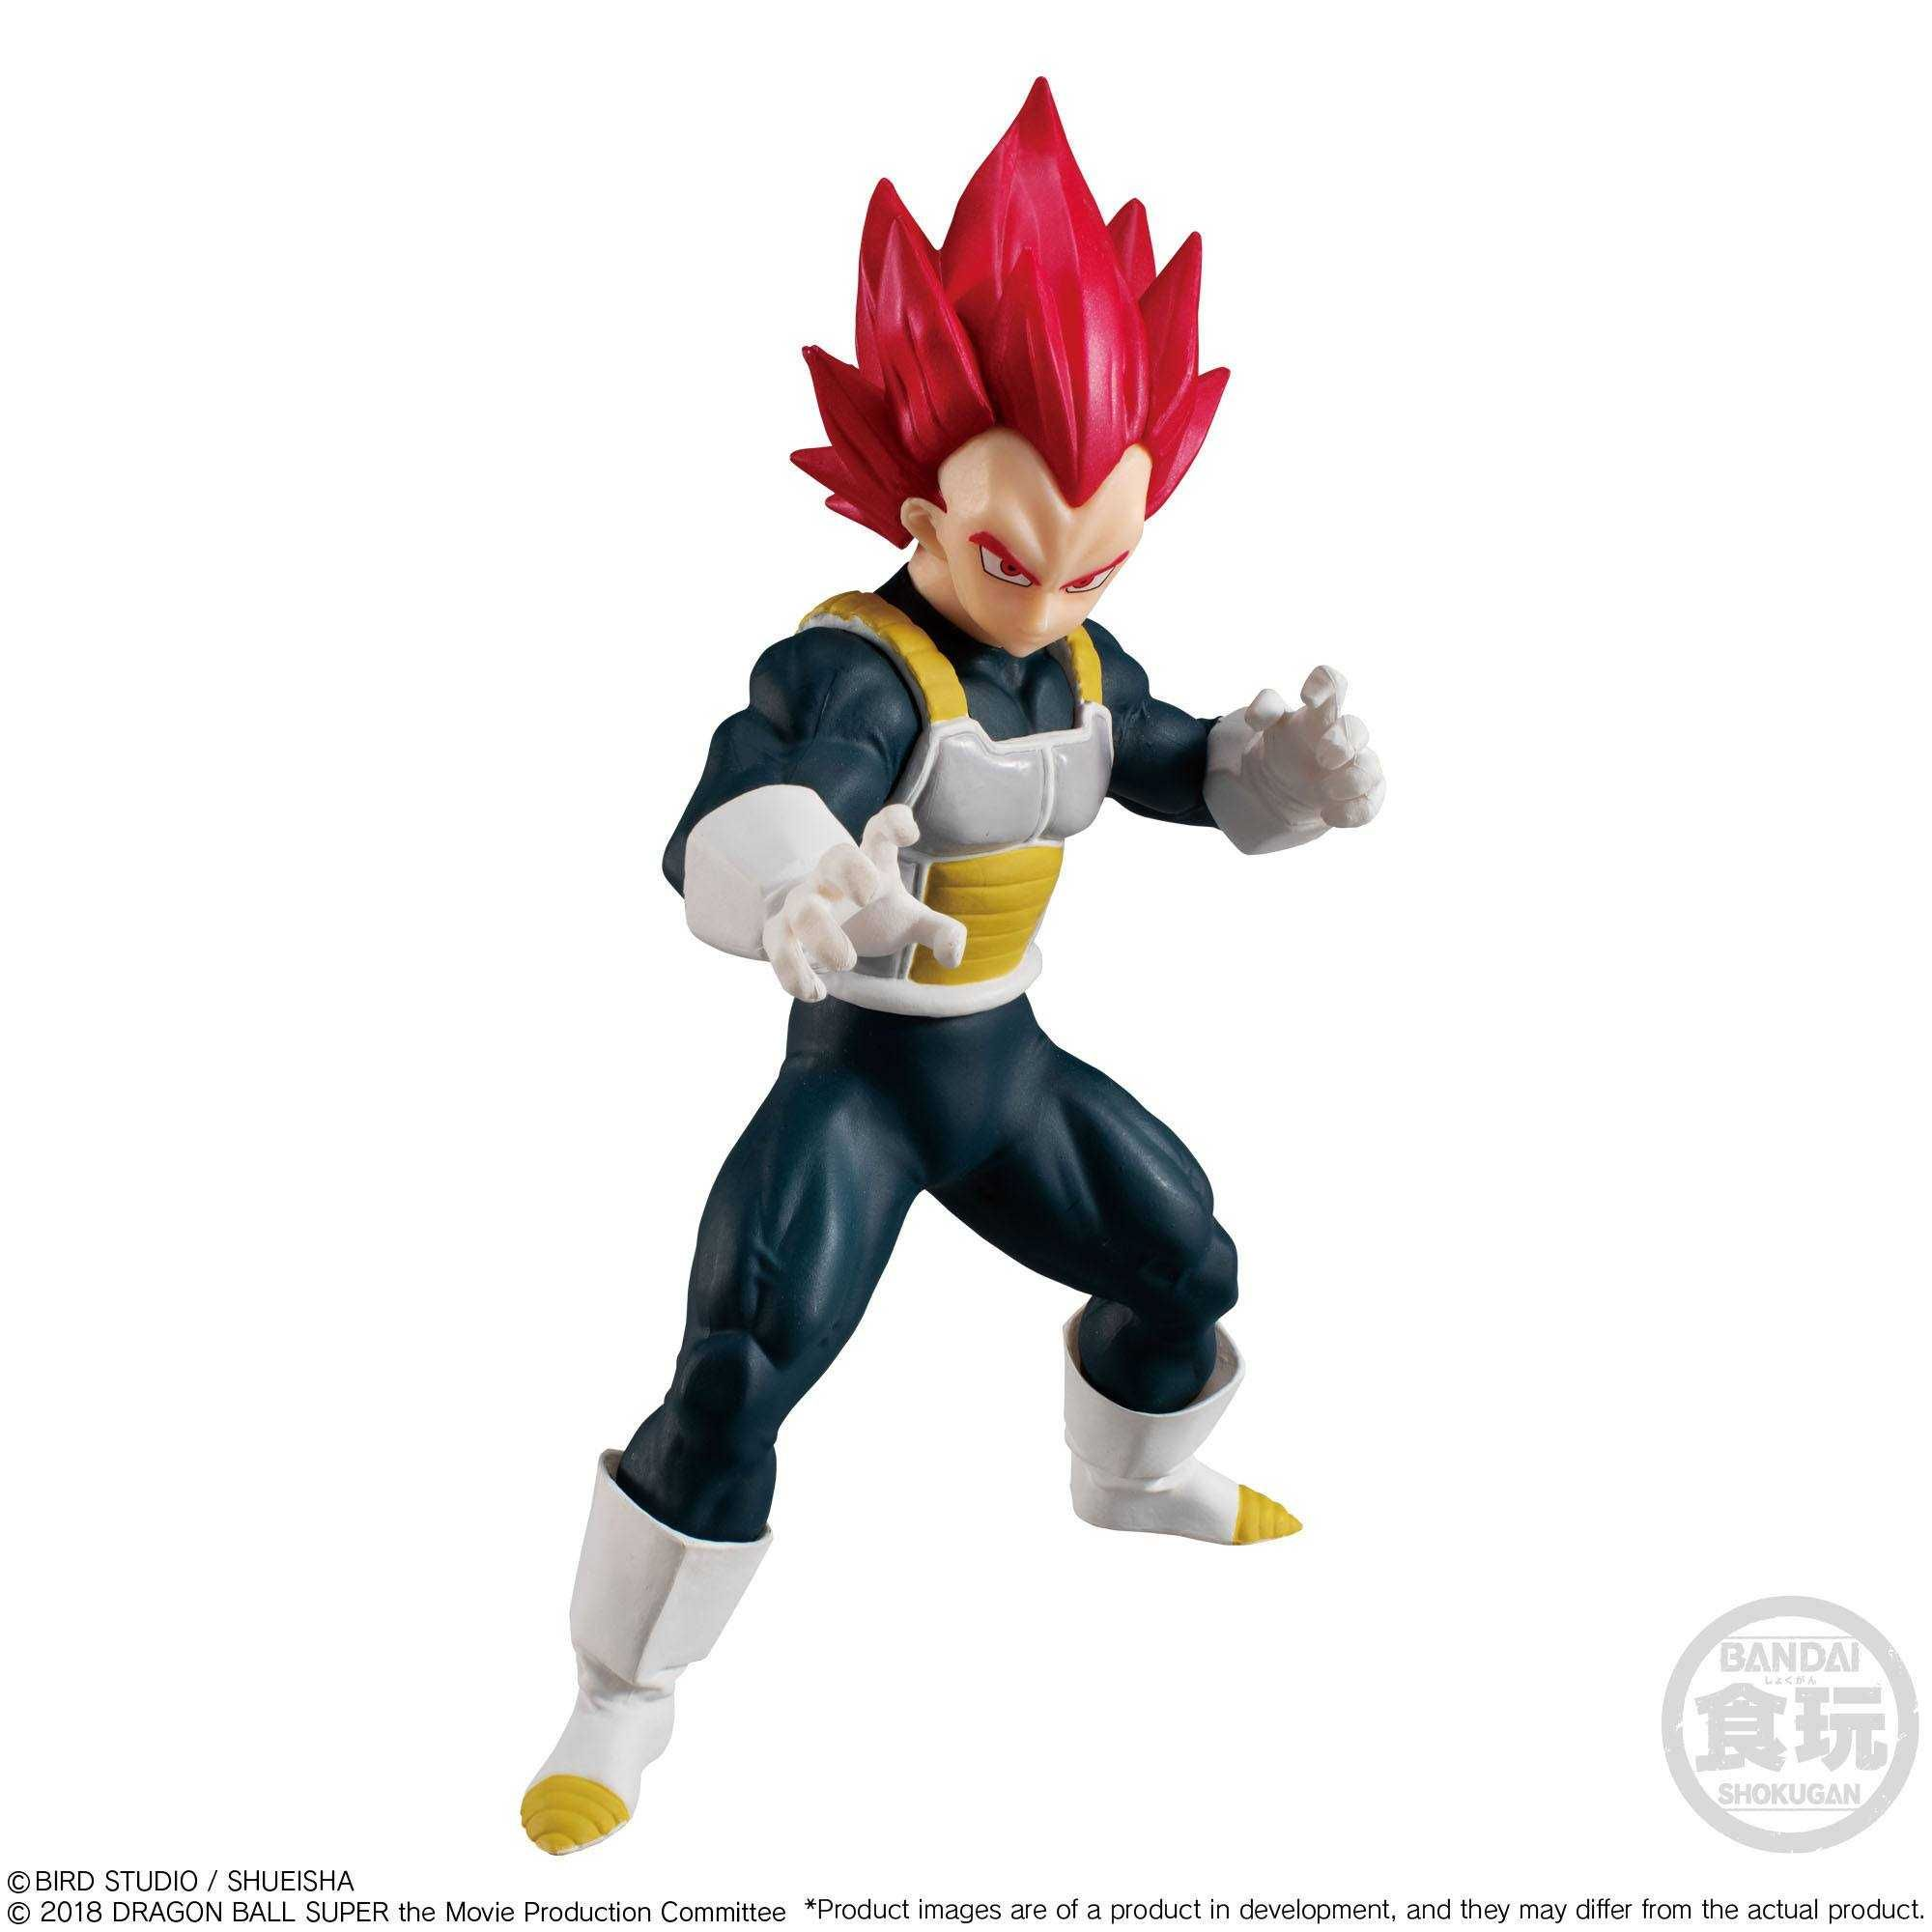 BANDAI DRAGON BALL STYLING Super Saiyan God super saiyan GOGETA Blue Figure